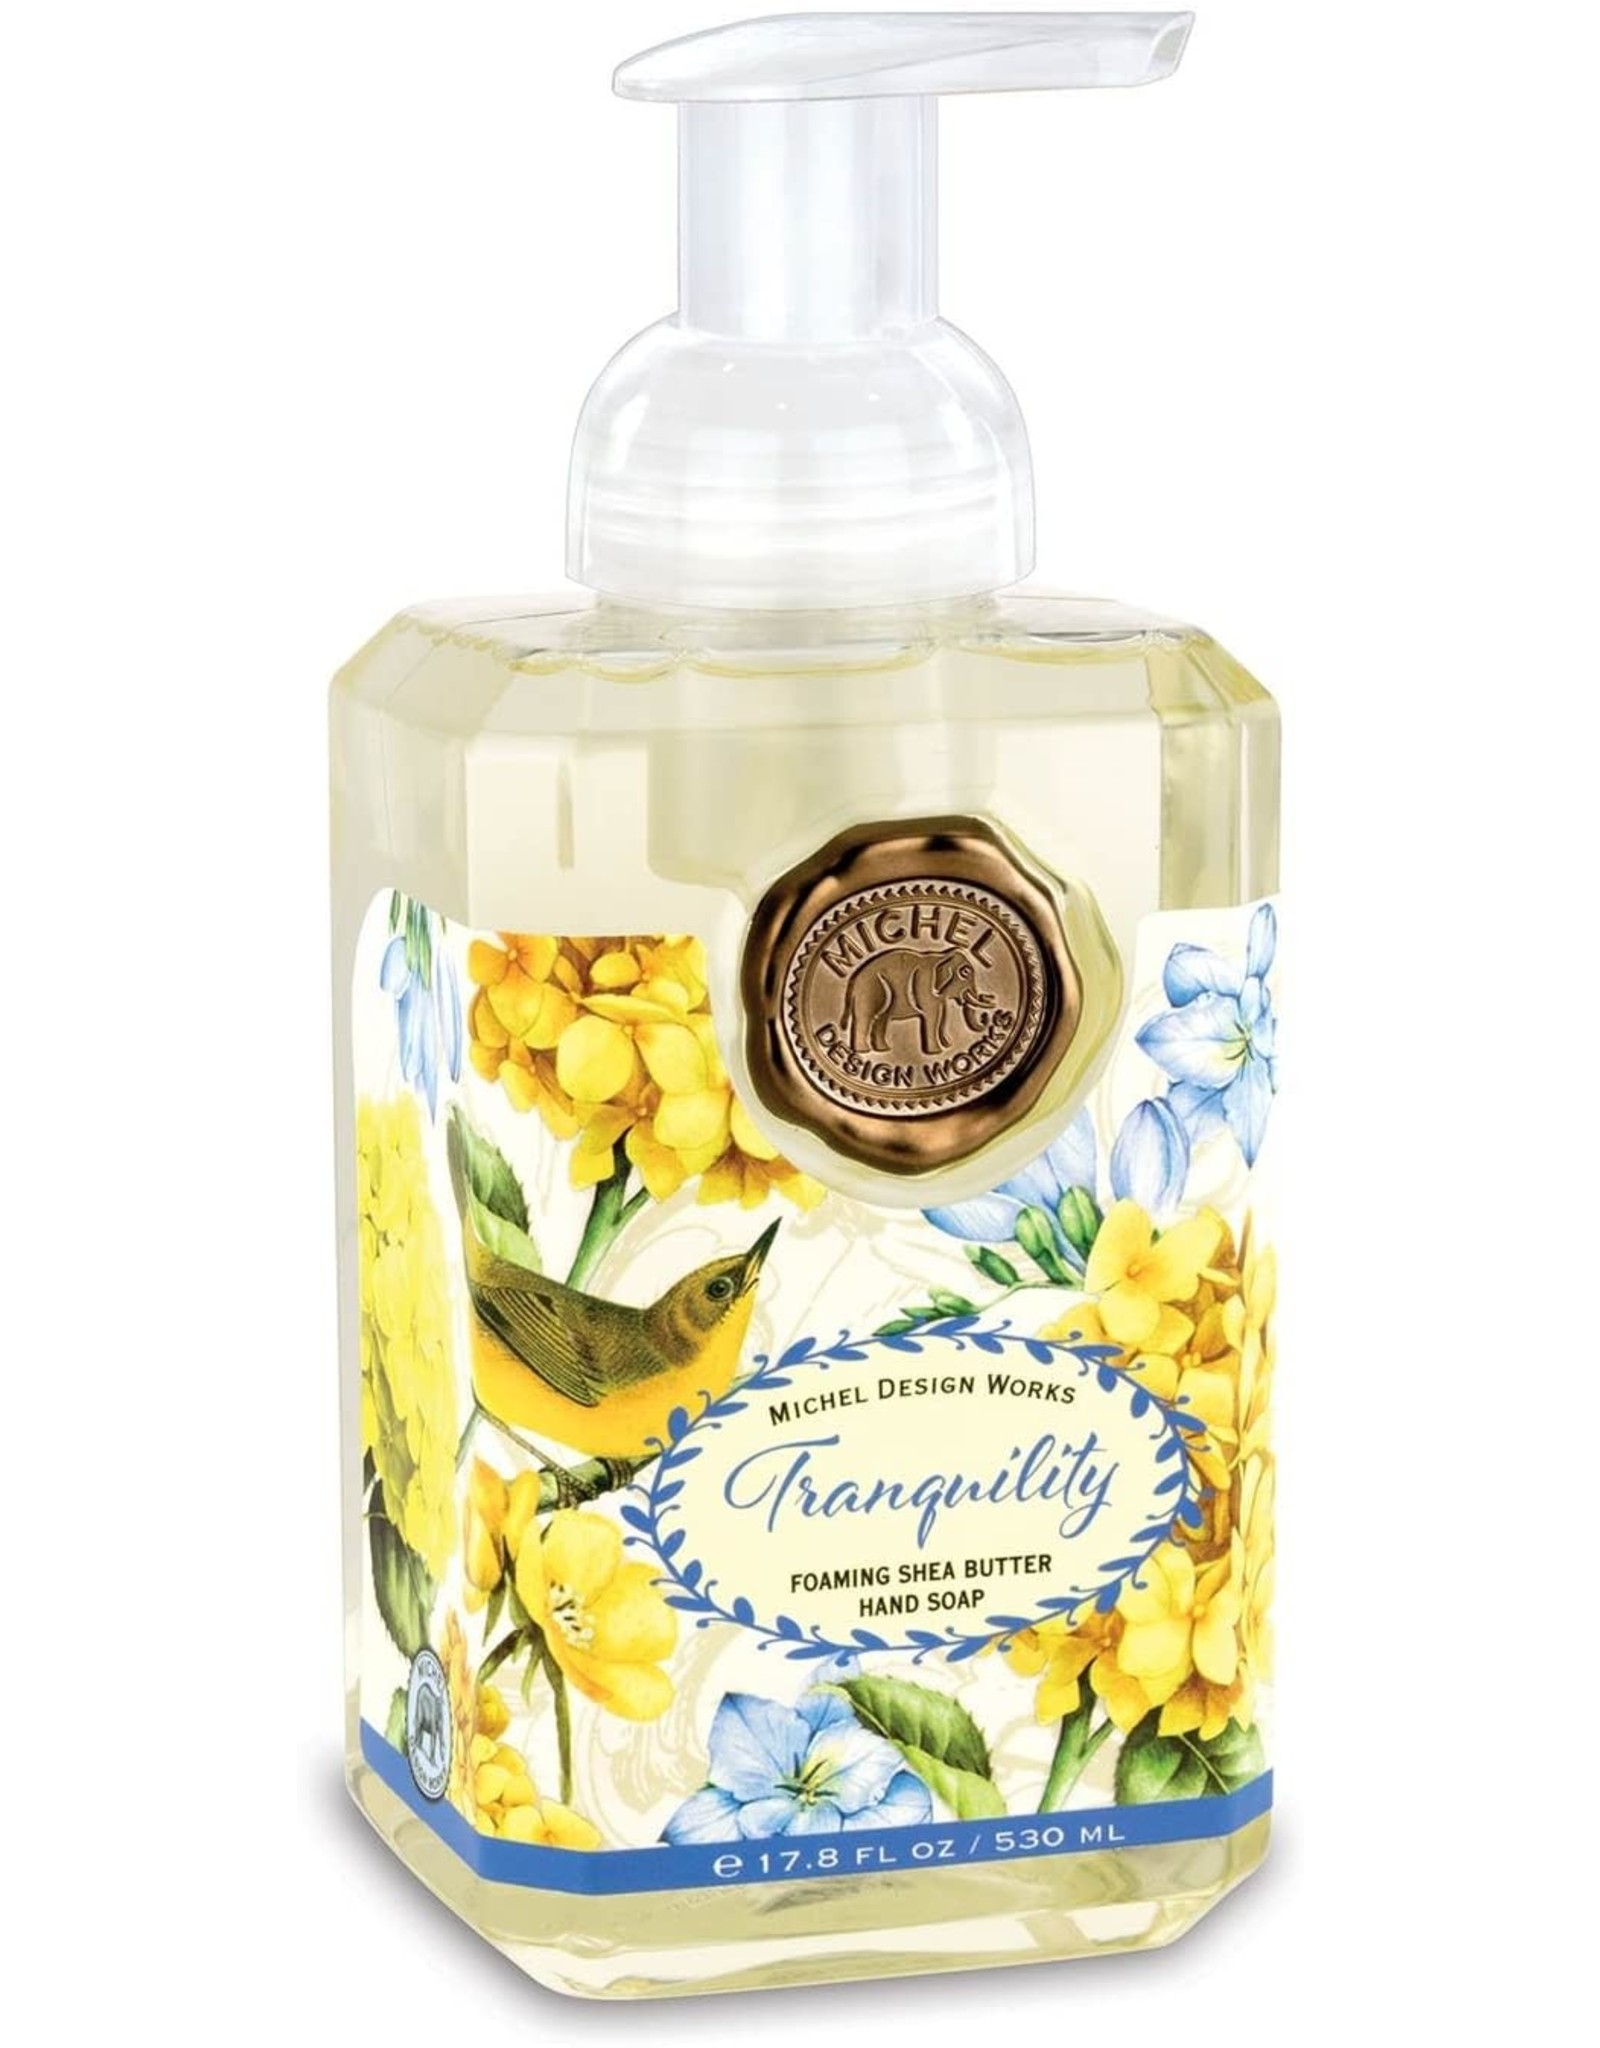 Michel Design Foaming Hand Soap, Tranquility, 17.8oz